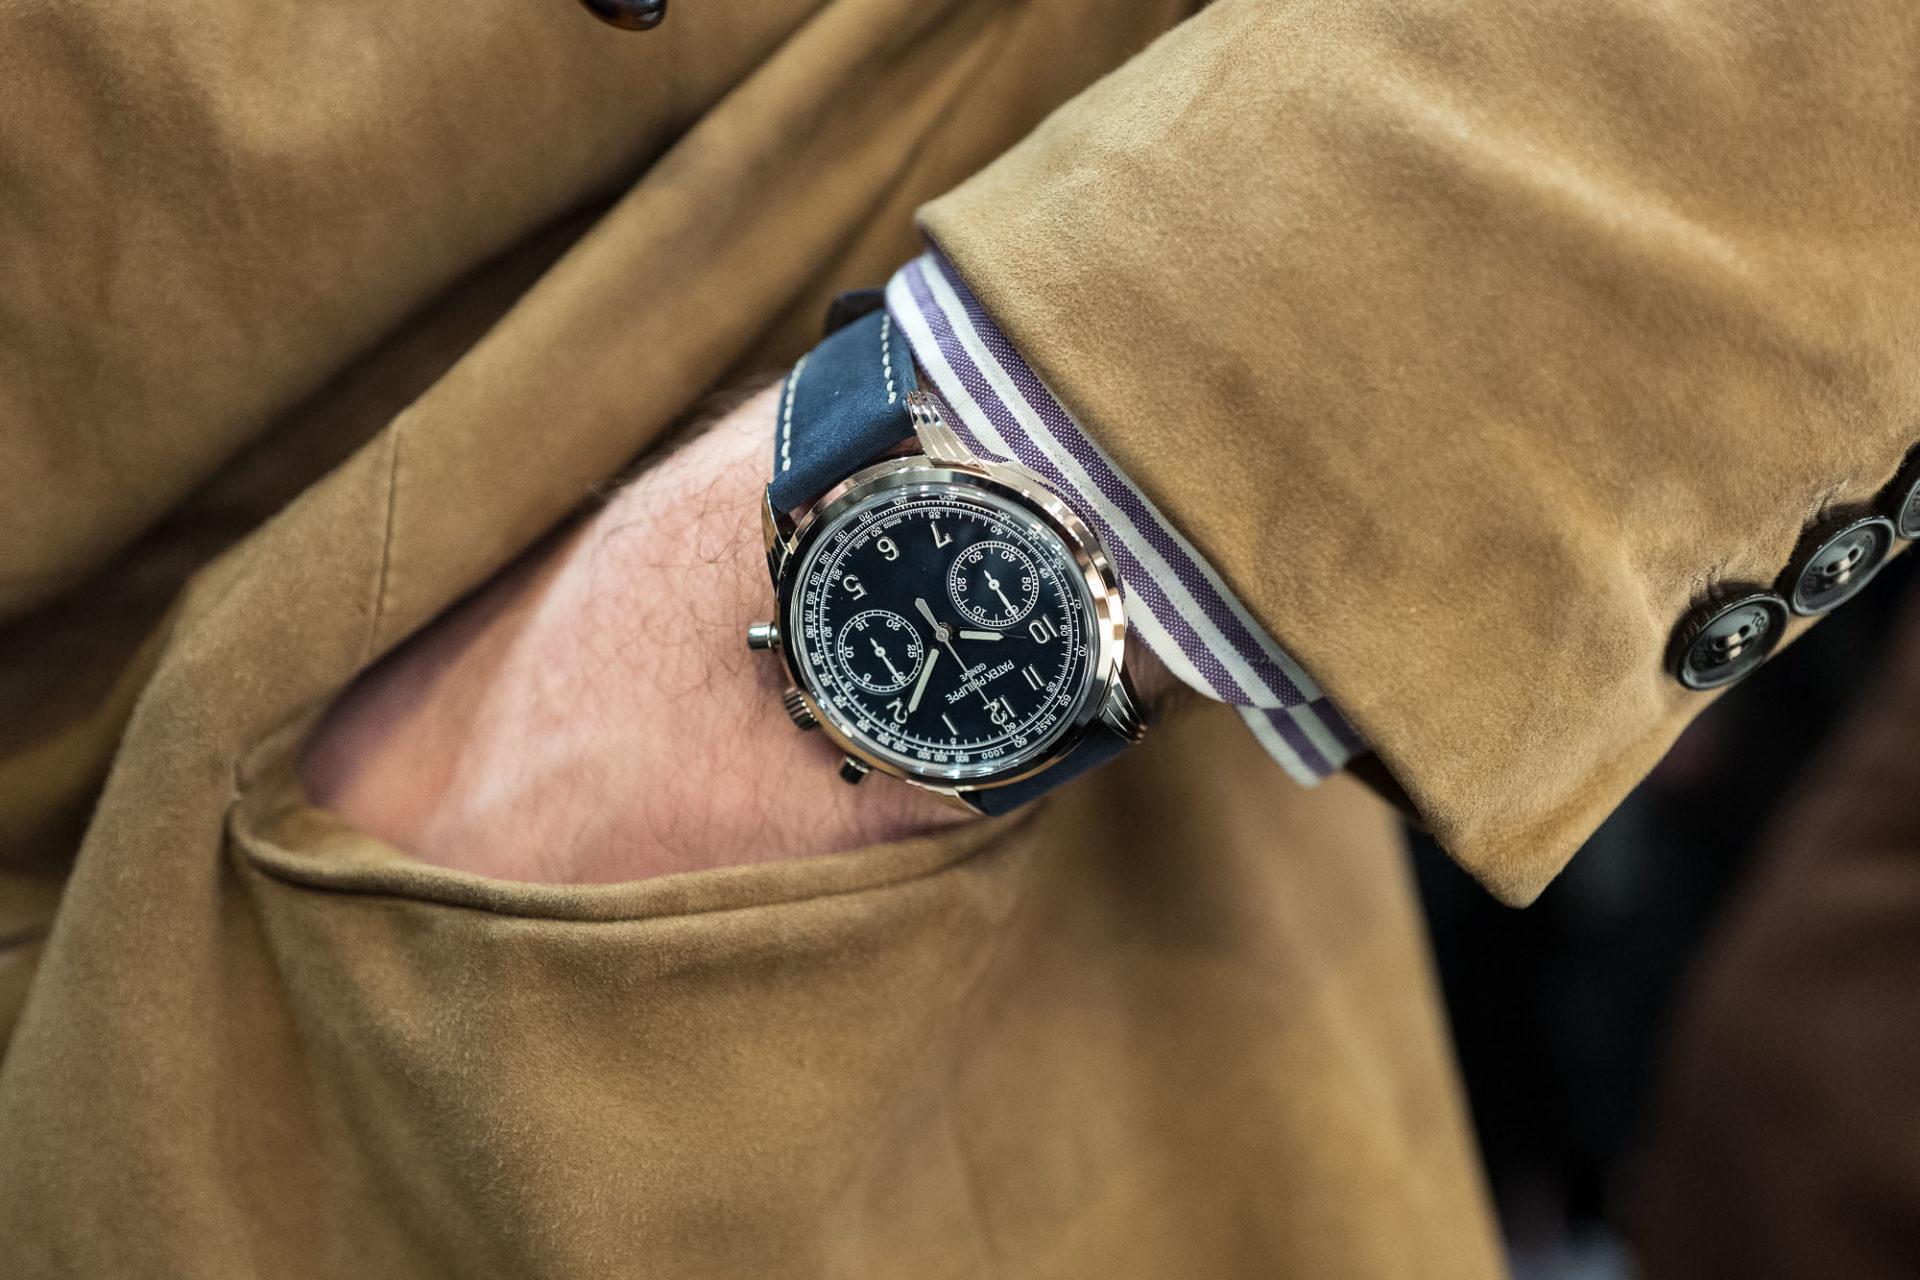 Patek Philippe Chronograph 5172G - Style